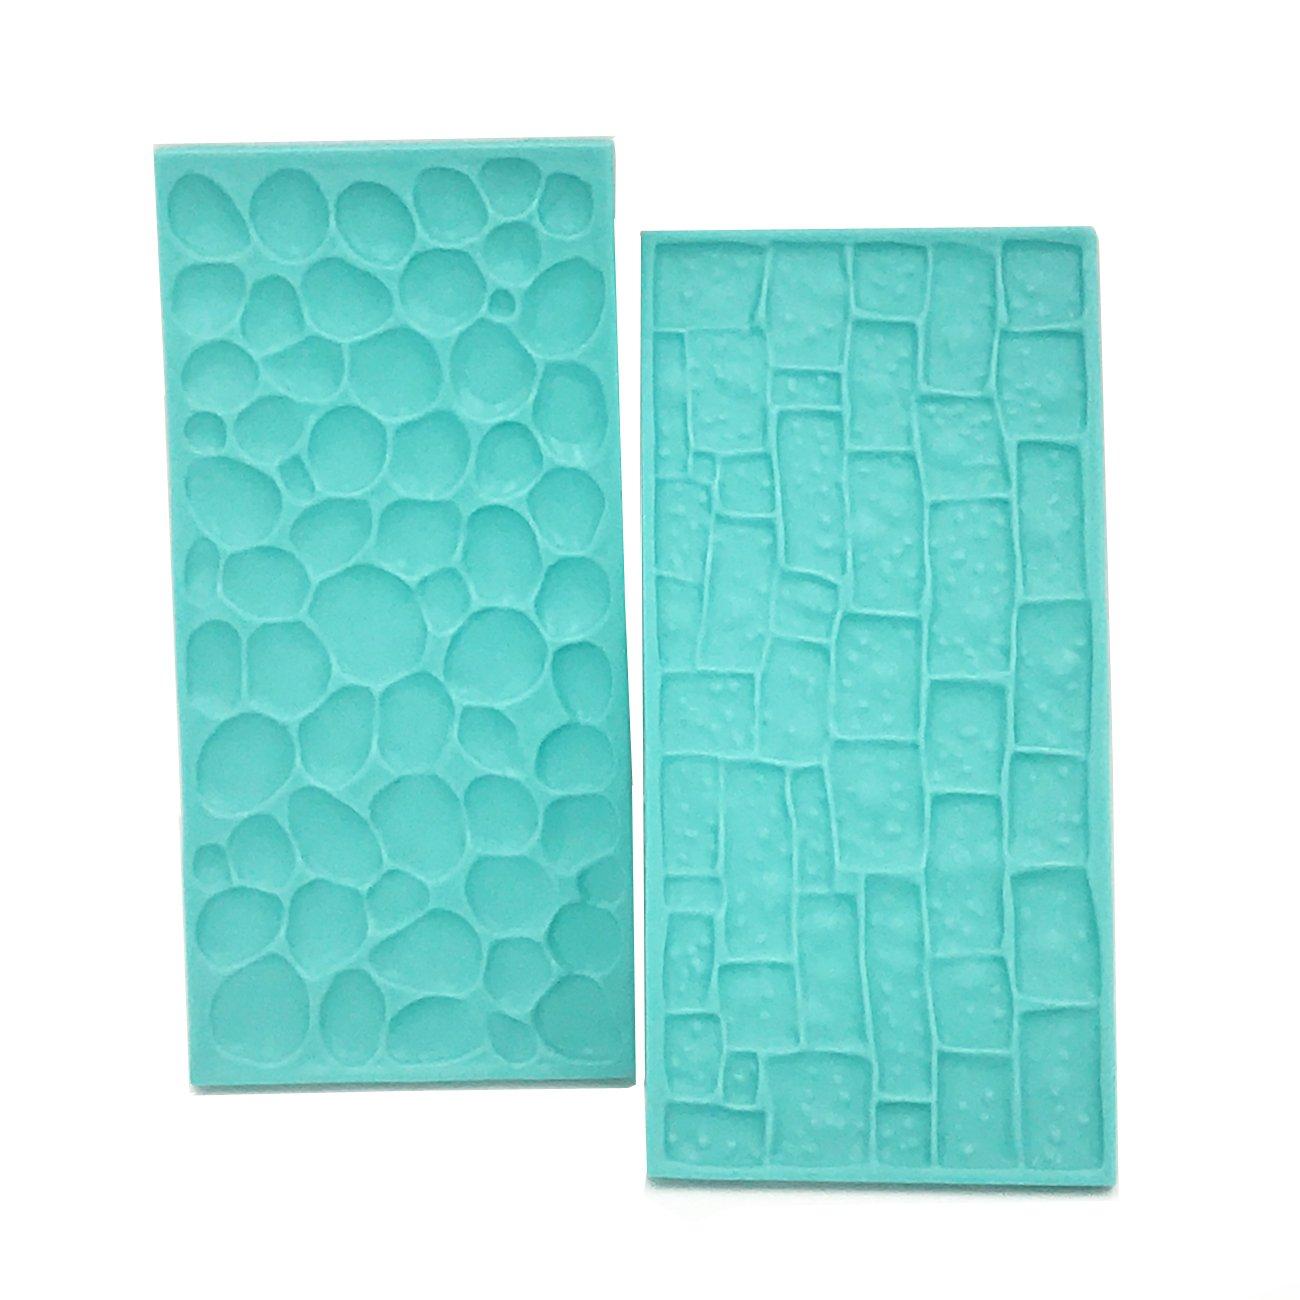 f513f2077 Amazon.com  Fondant Impression Mat Set - Cobblestone   Stone Wall Design  Sugarcraft Decorating Tool Gumpaste Embosser for Cup Cake Top Decoration  Color ...